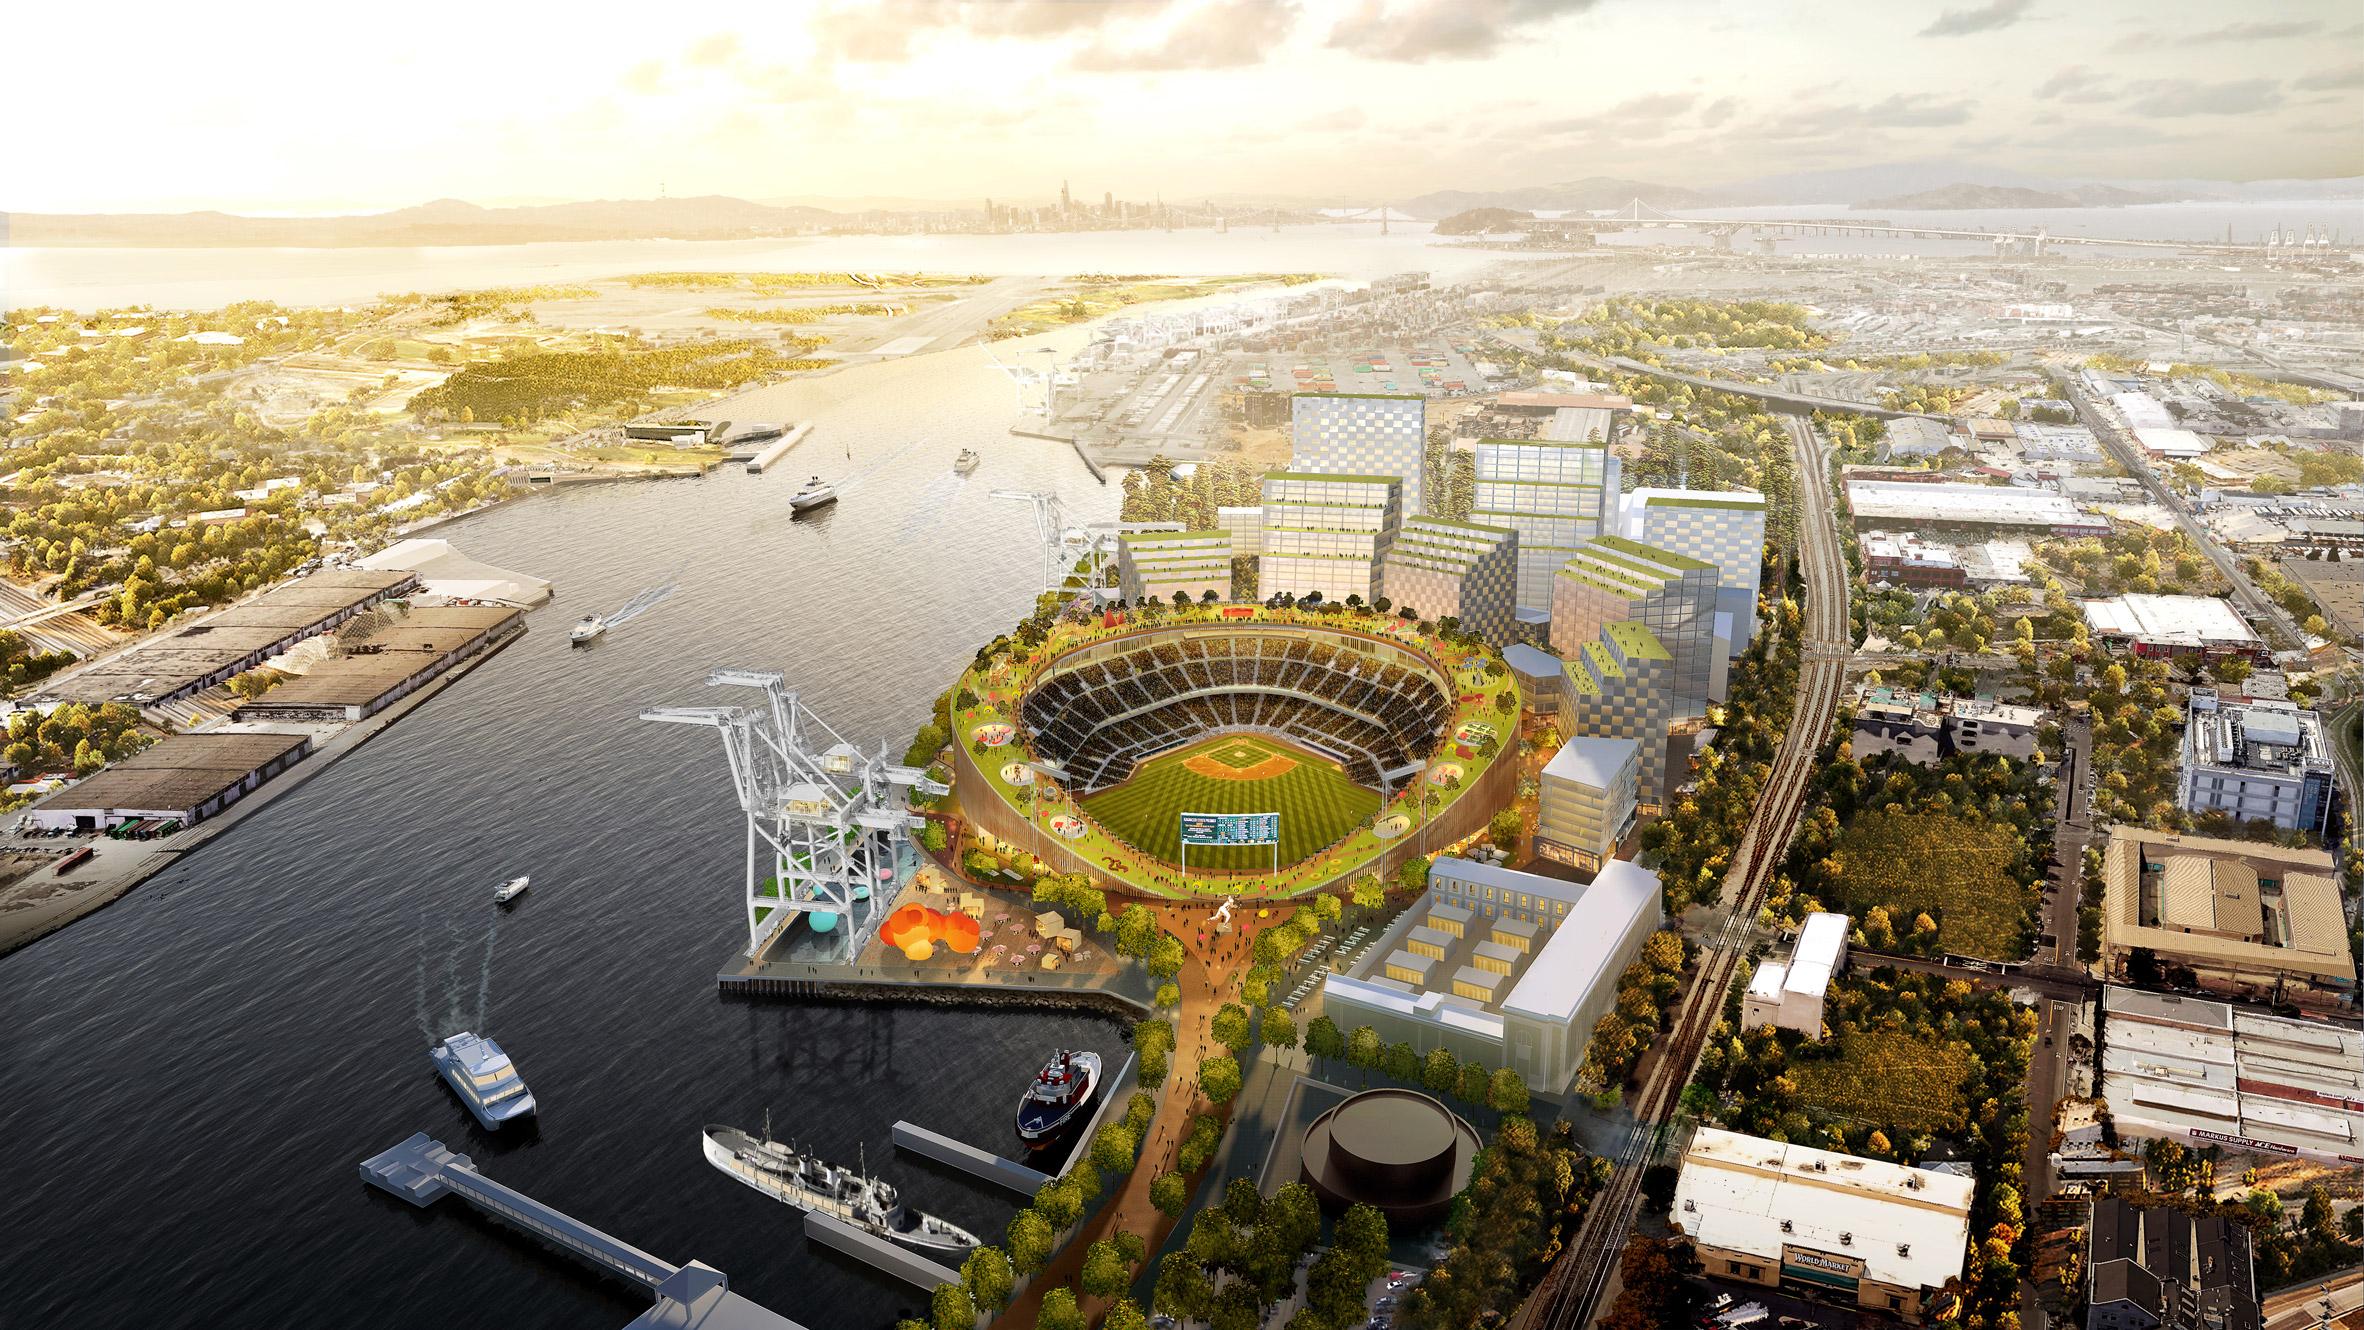 oakland-as-stadium-big-news-architecture-revision-california-usa_dezeen_2364_col_1.jpg